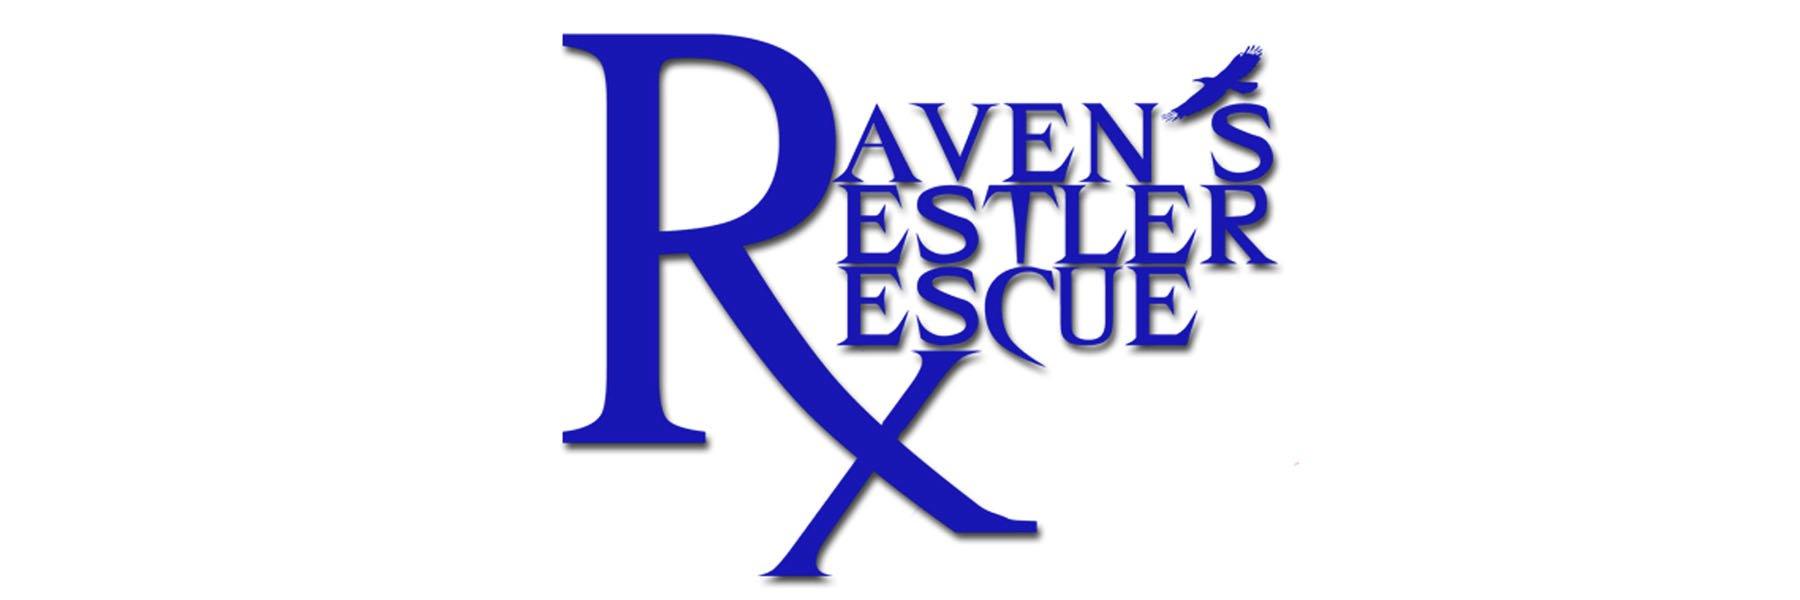 Raven's Restler Rescue